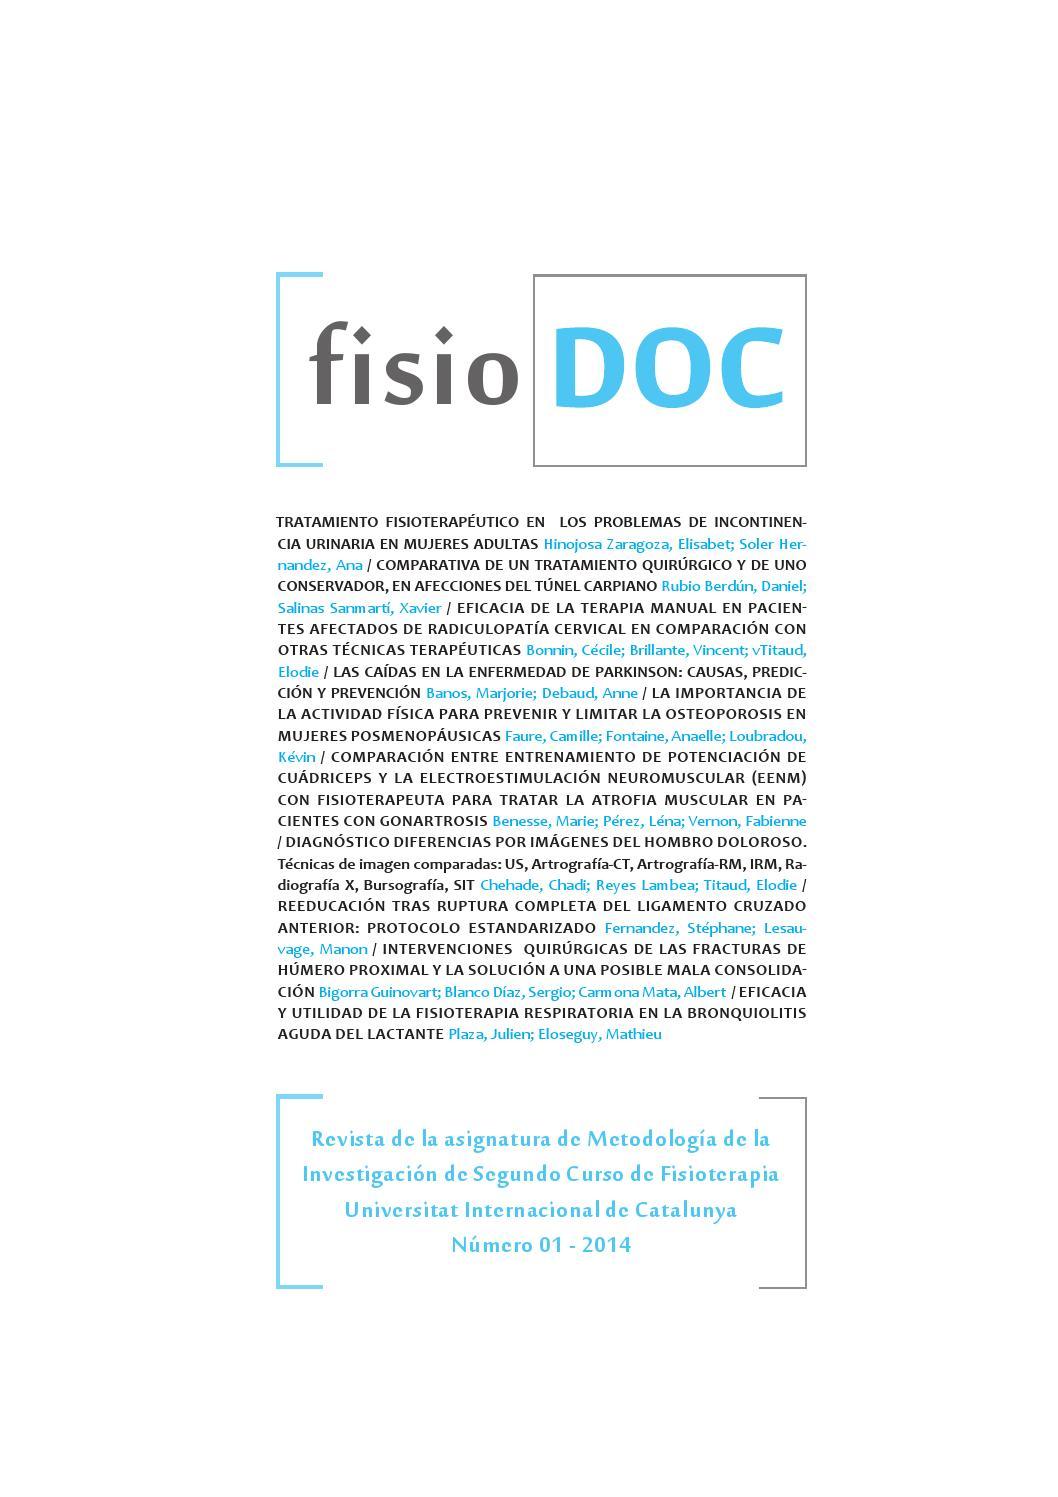 Fisiodoc num. 01 by Departament de Fisioteràpia. Universitat ...